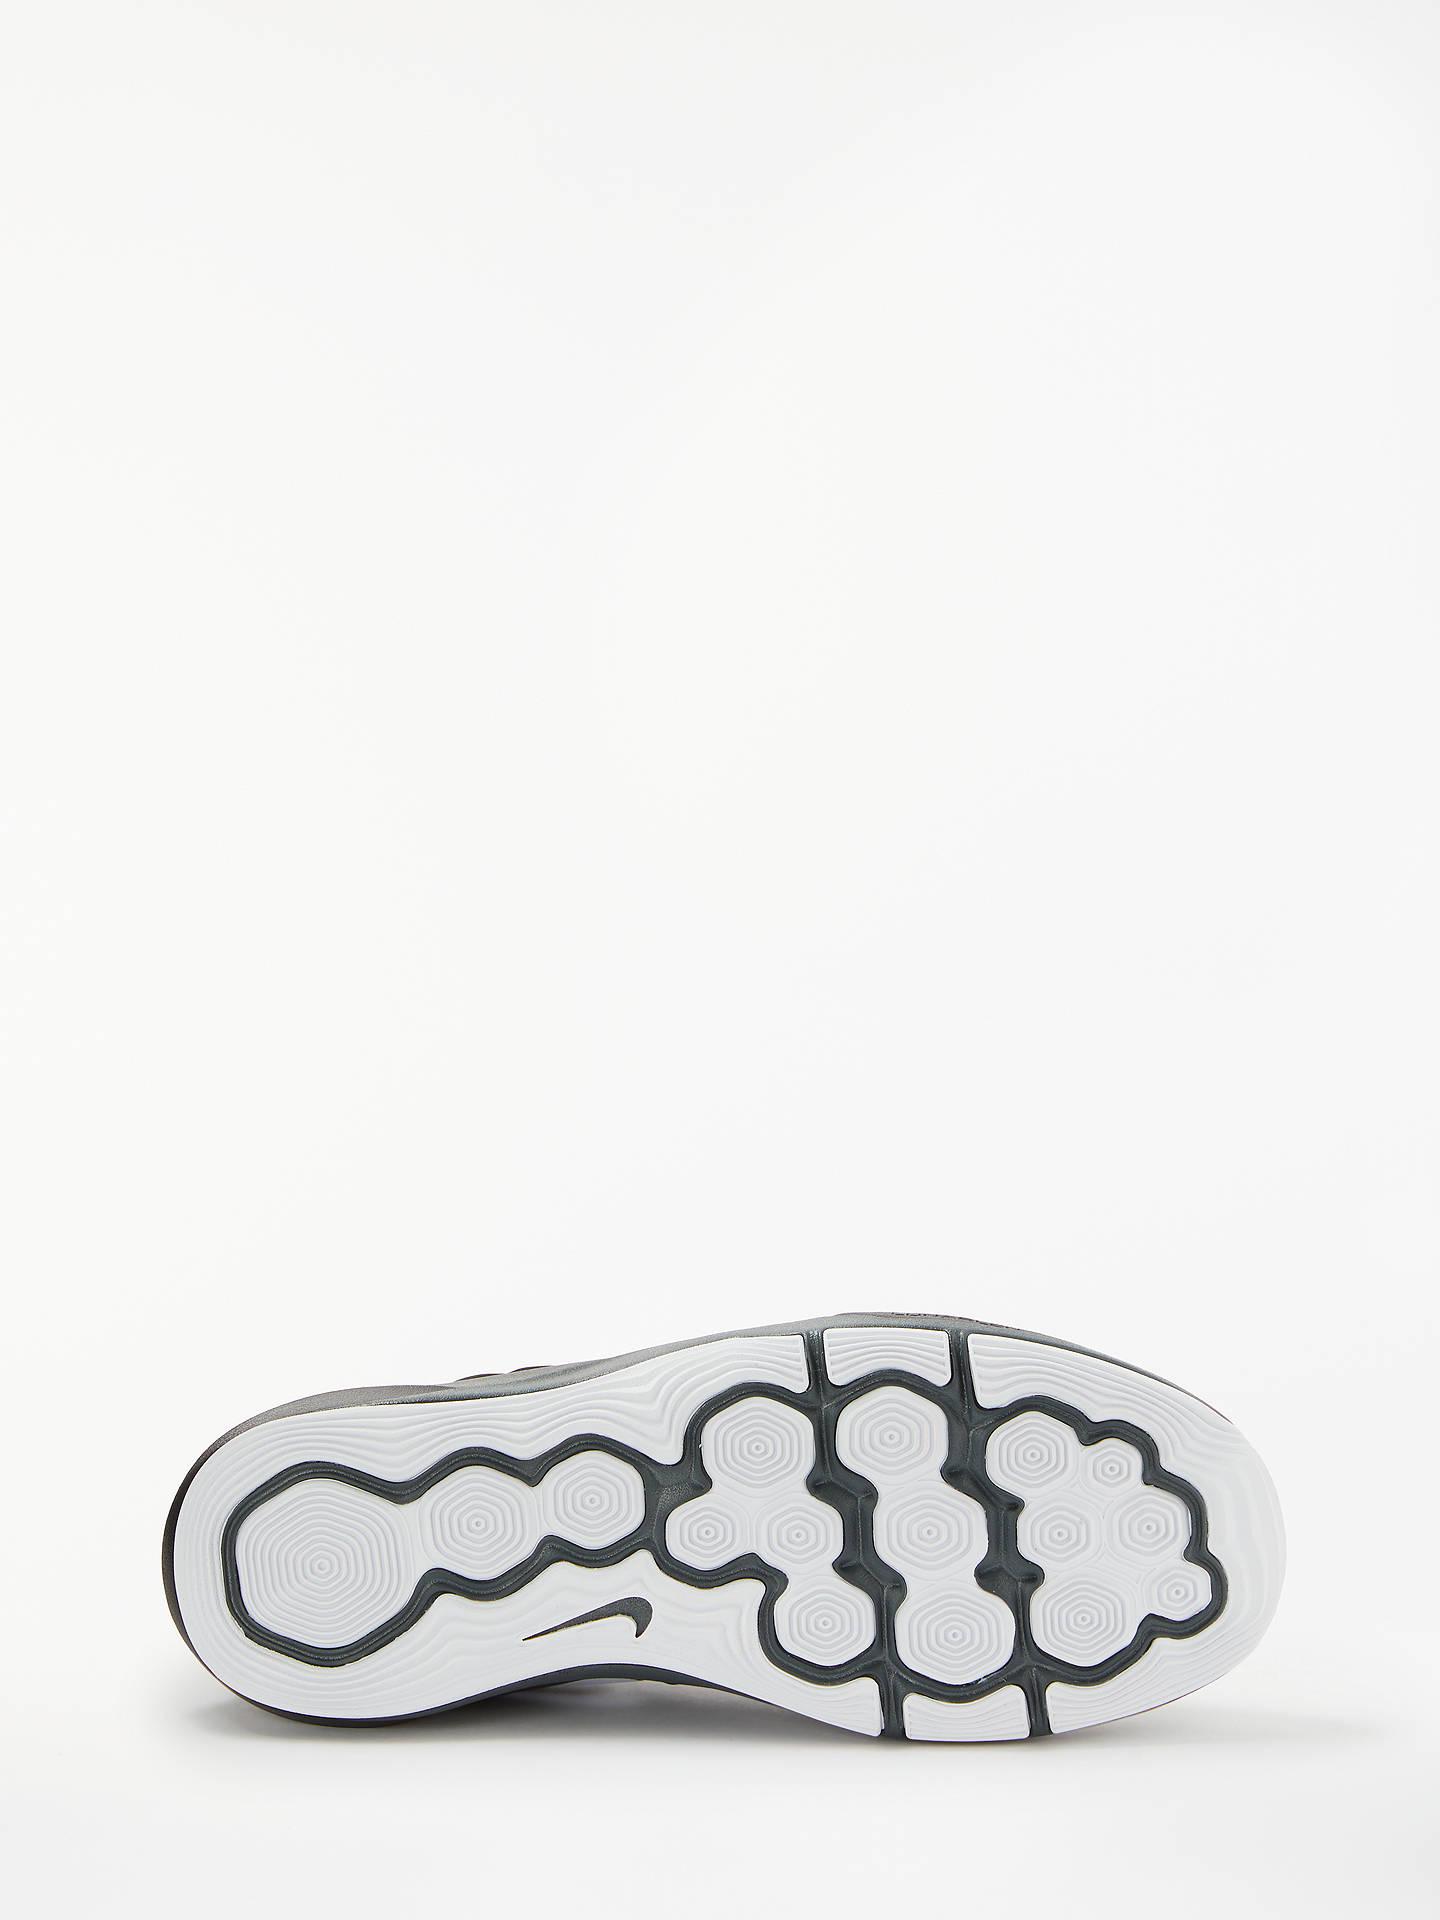 Nike Lunar Prime Iron Ii Metallic Gray Color Hair - Musée des ... 4c25628fafa32